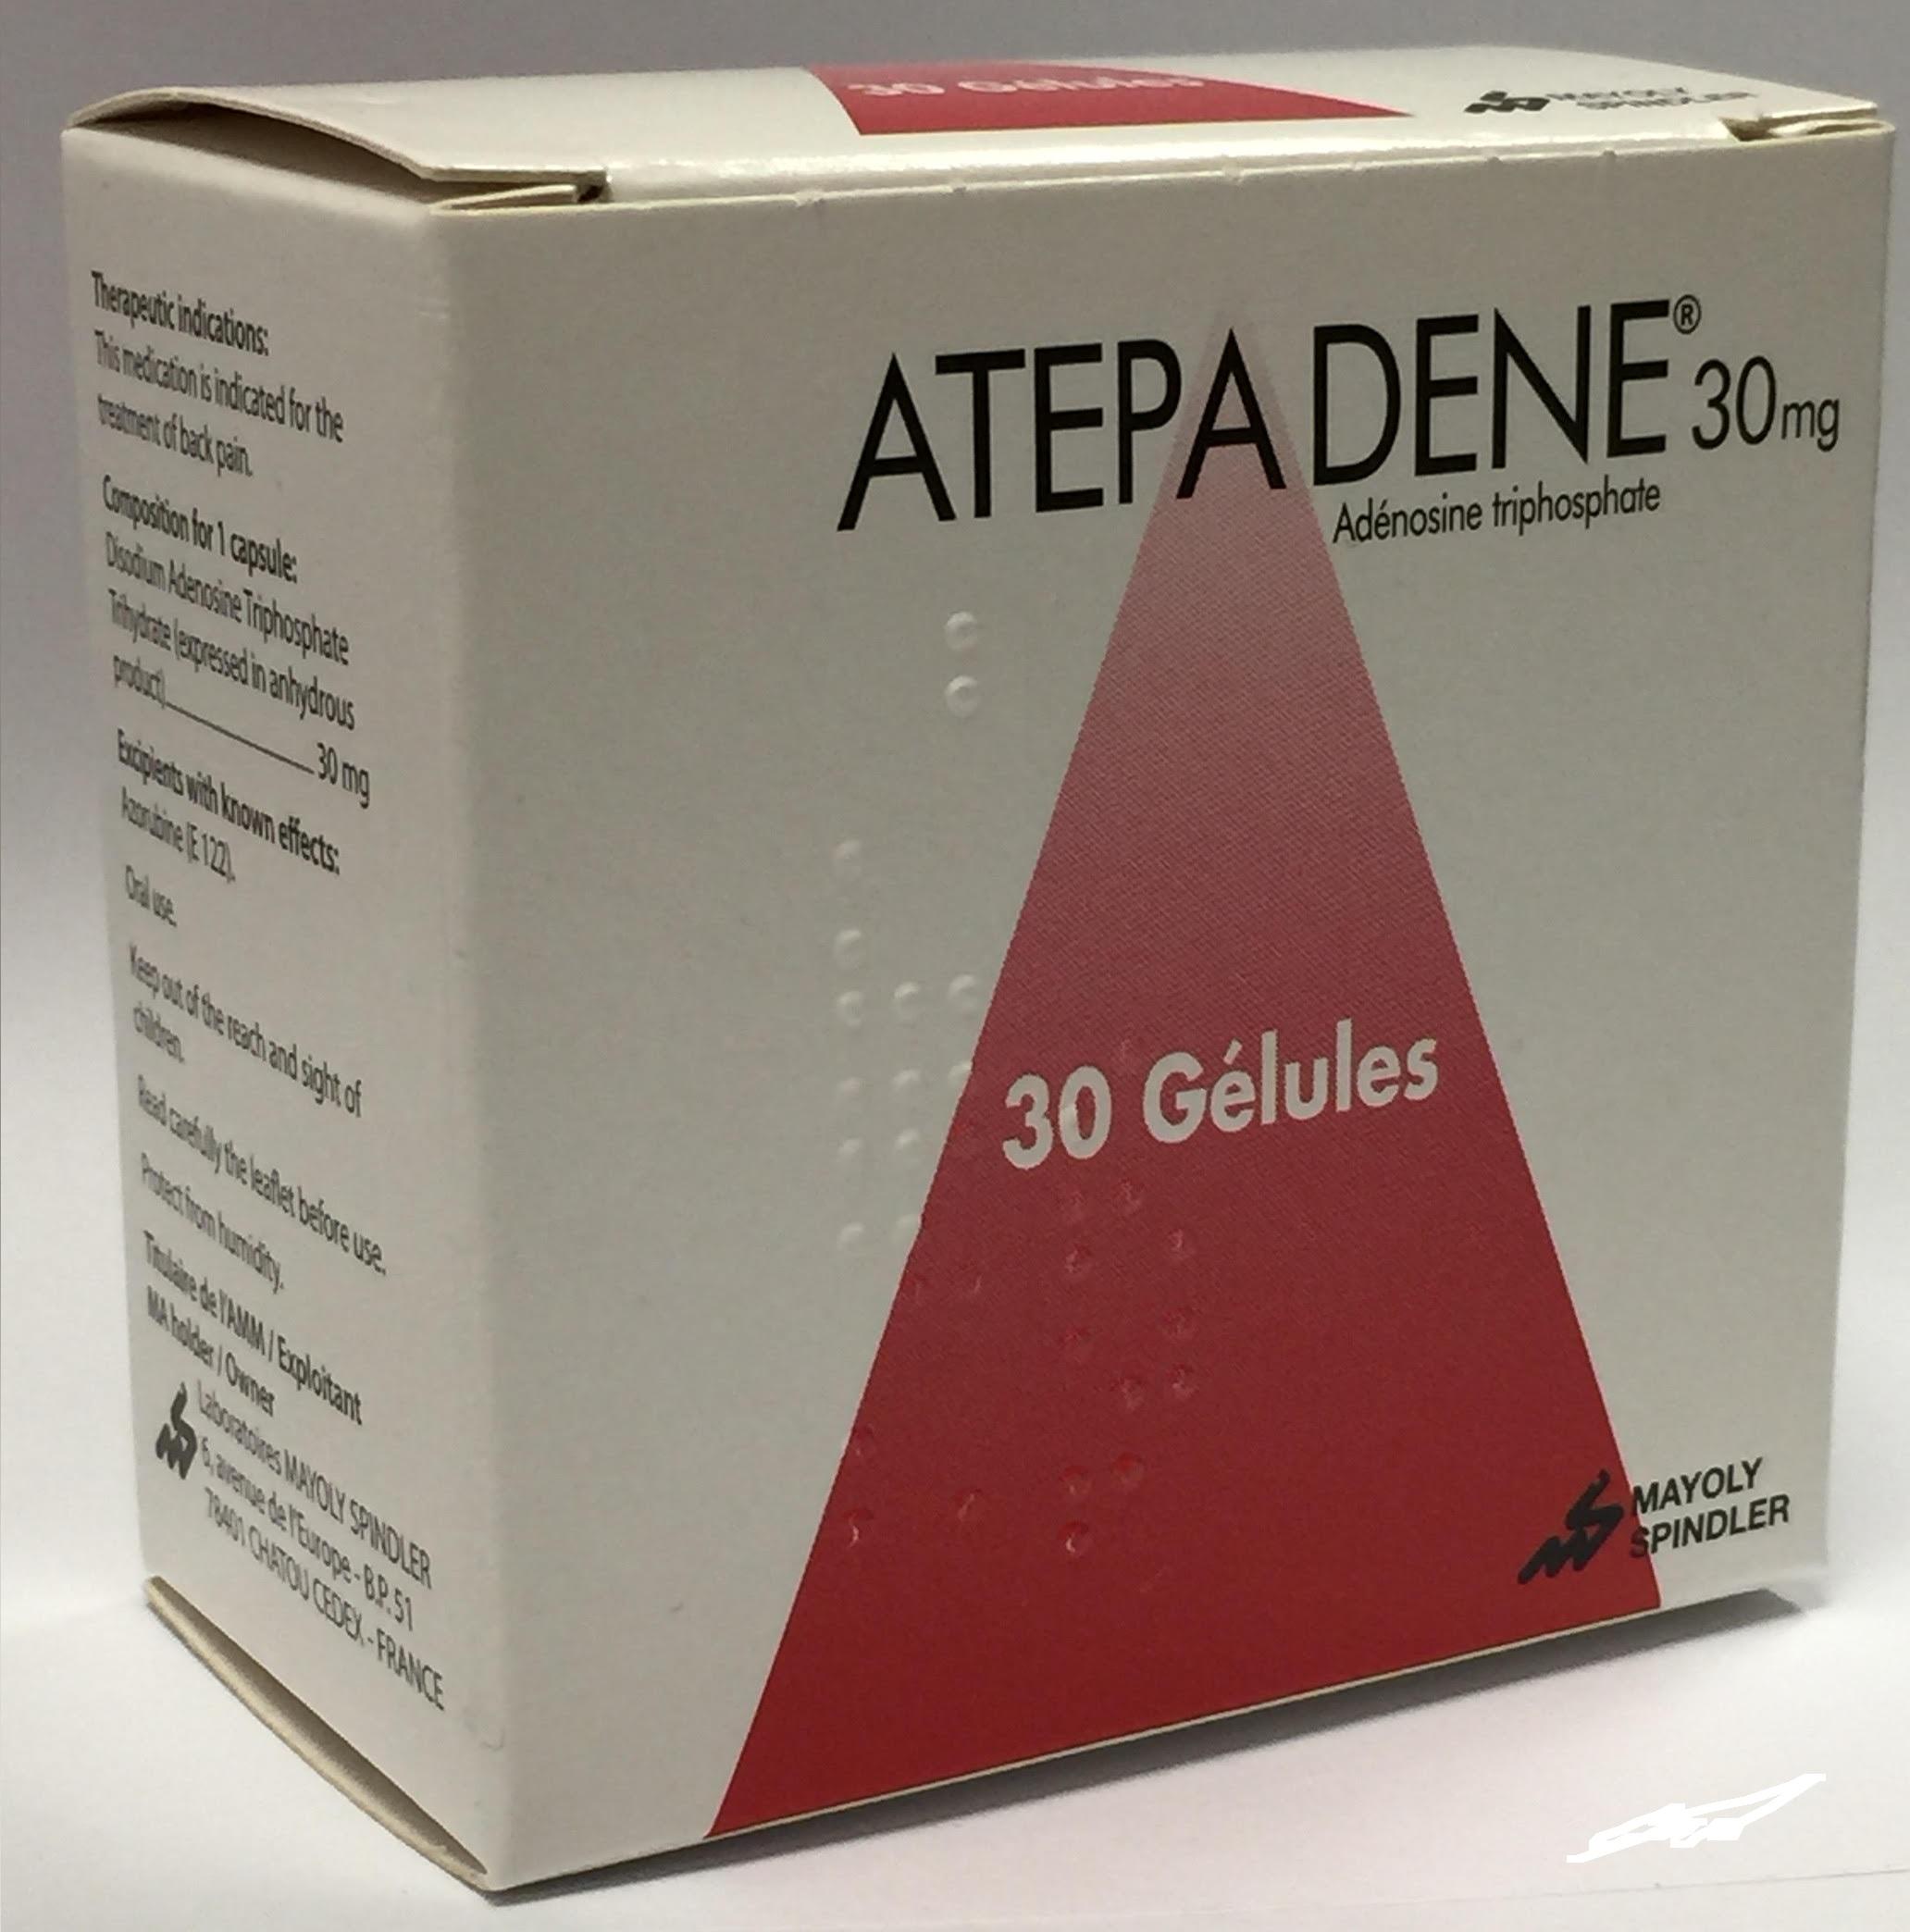 Atepadene 30 mg - Mayoly Spindler